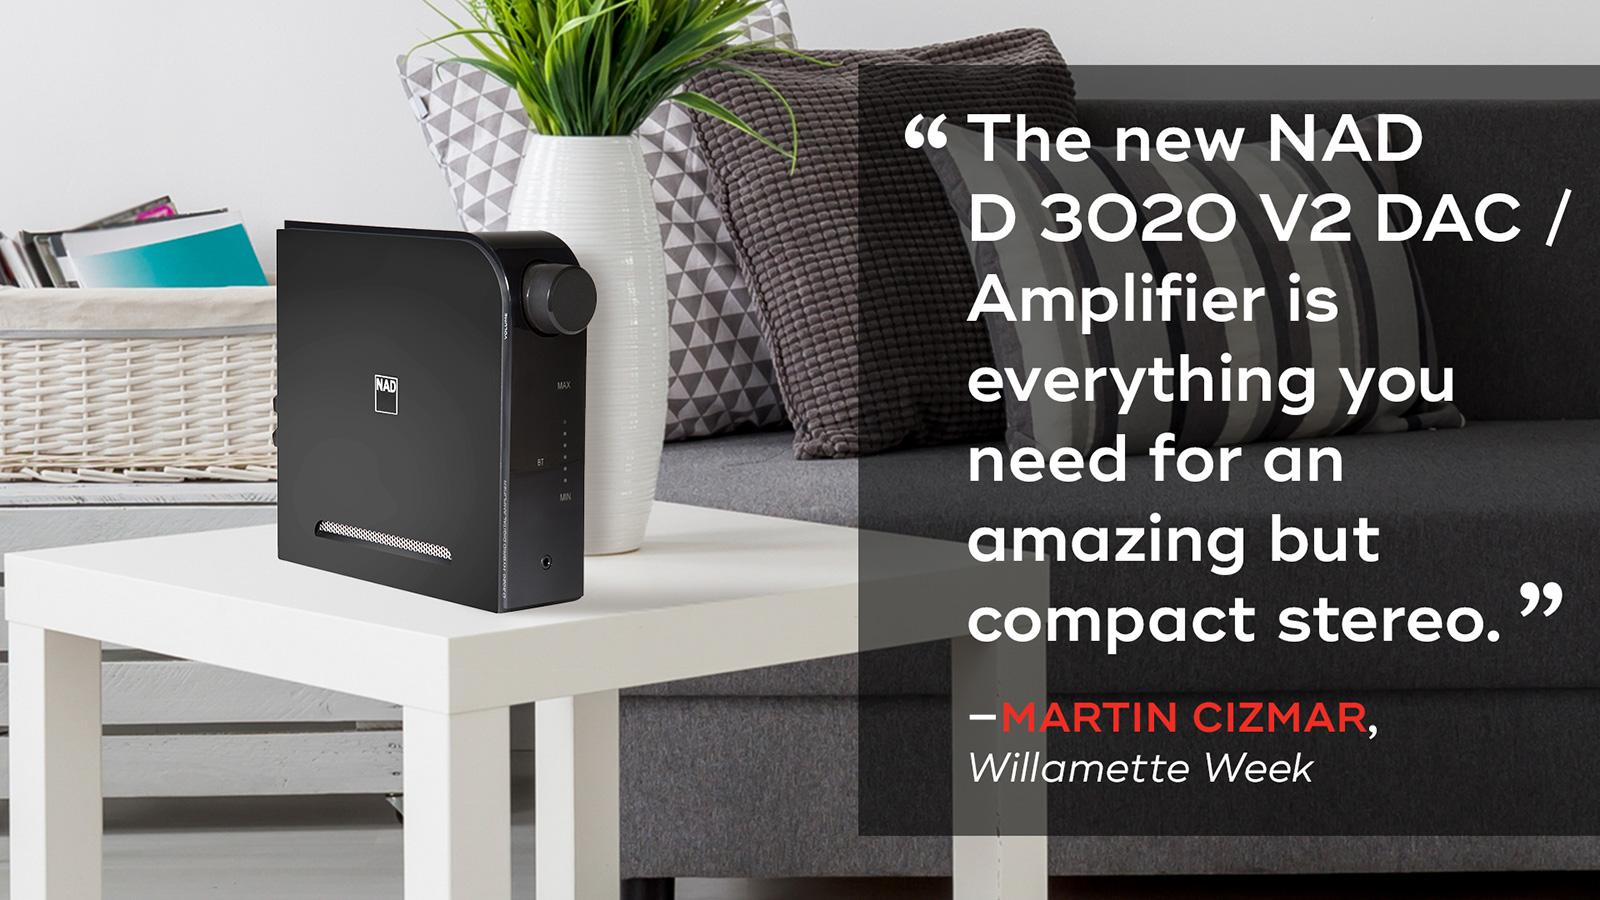 D 3020 V2 Amplifier